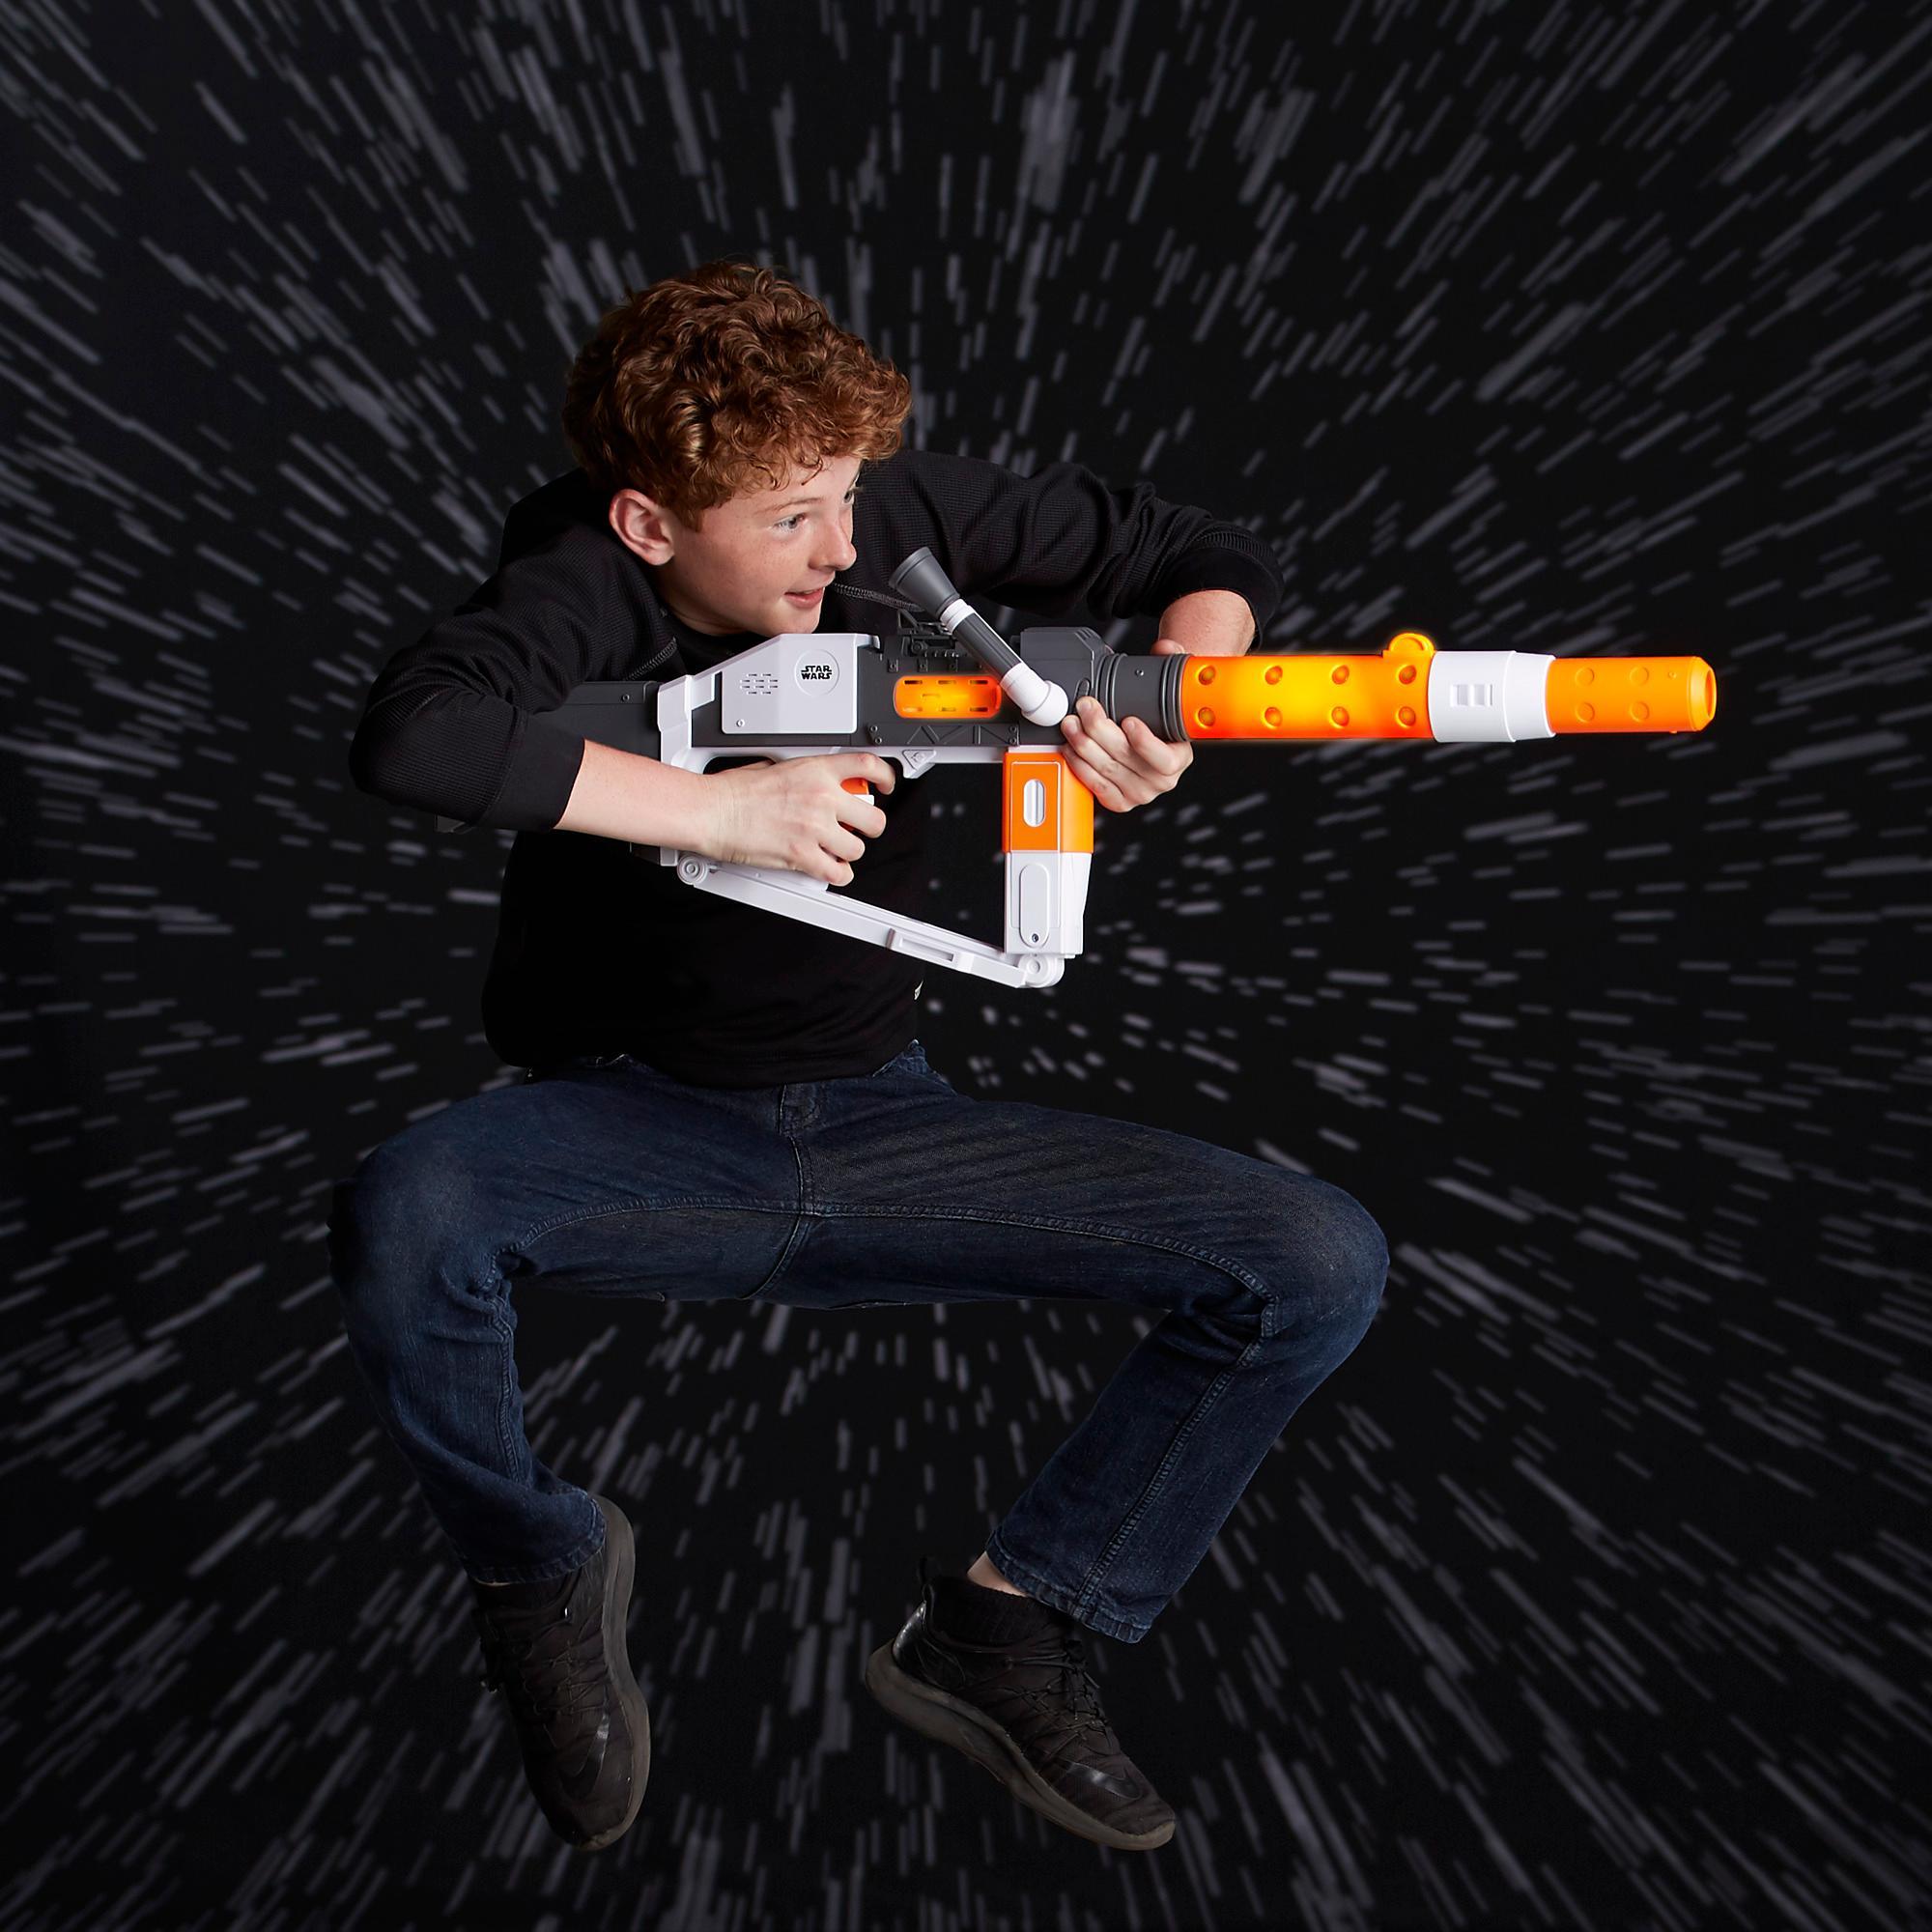 Star Wars Nerf First Order Stormtrooper Deluxe Blaster